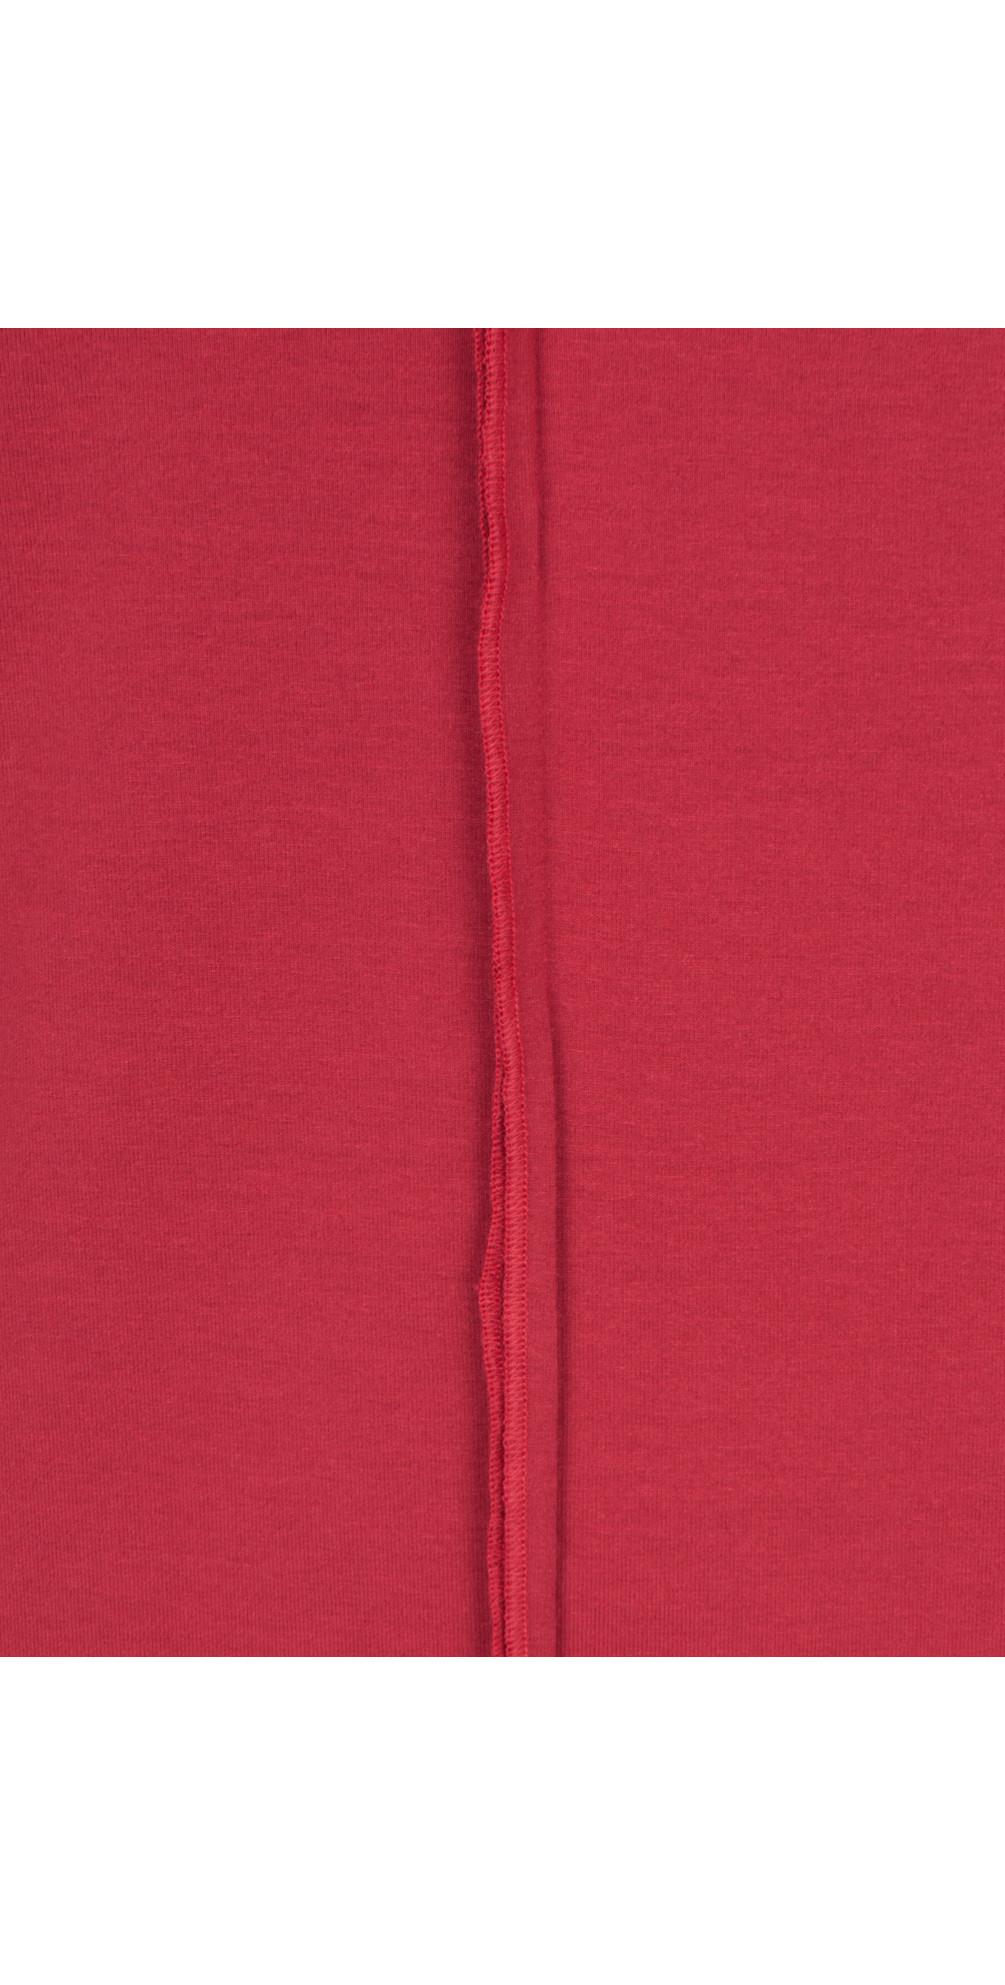 Long Sleeve Top main image